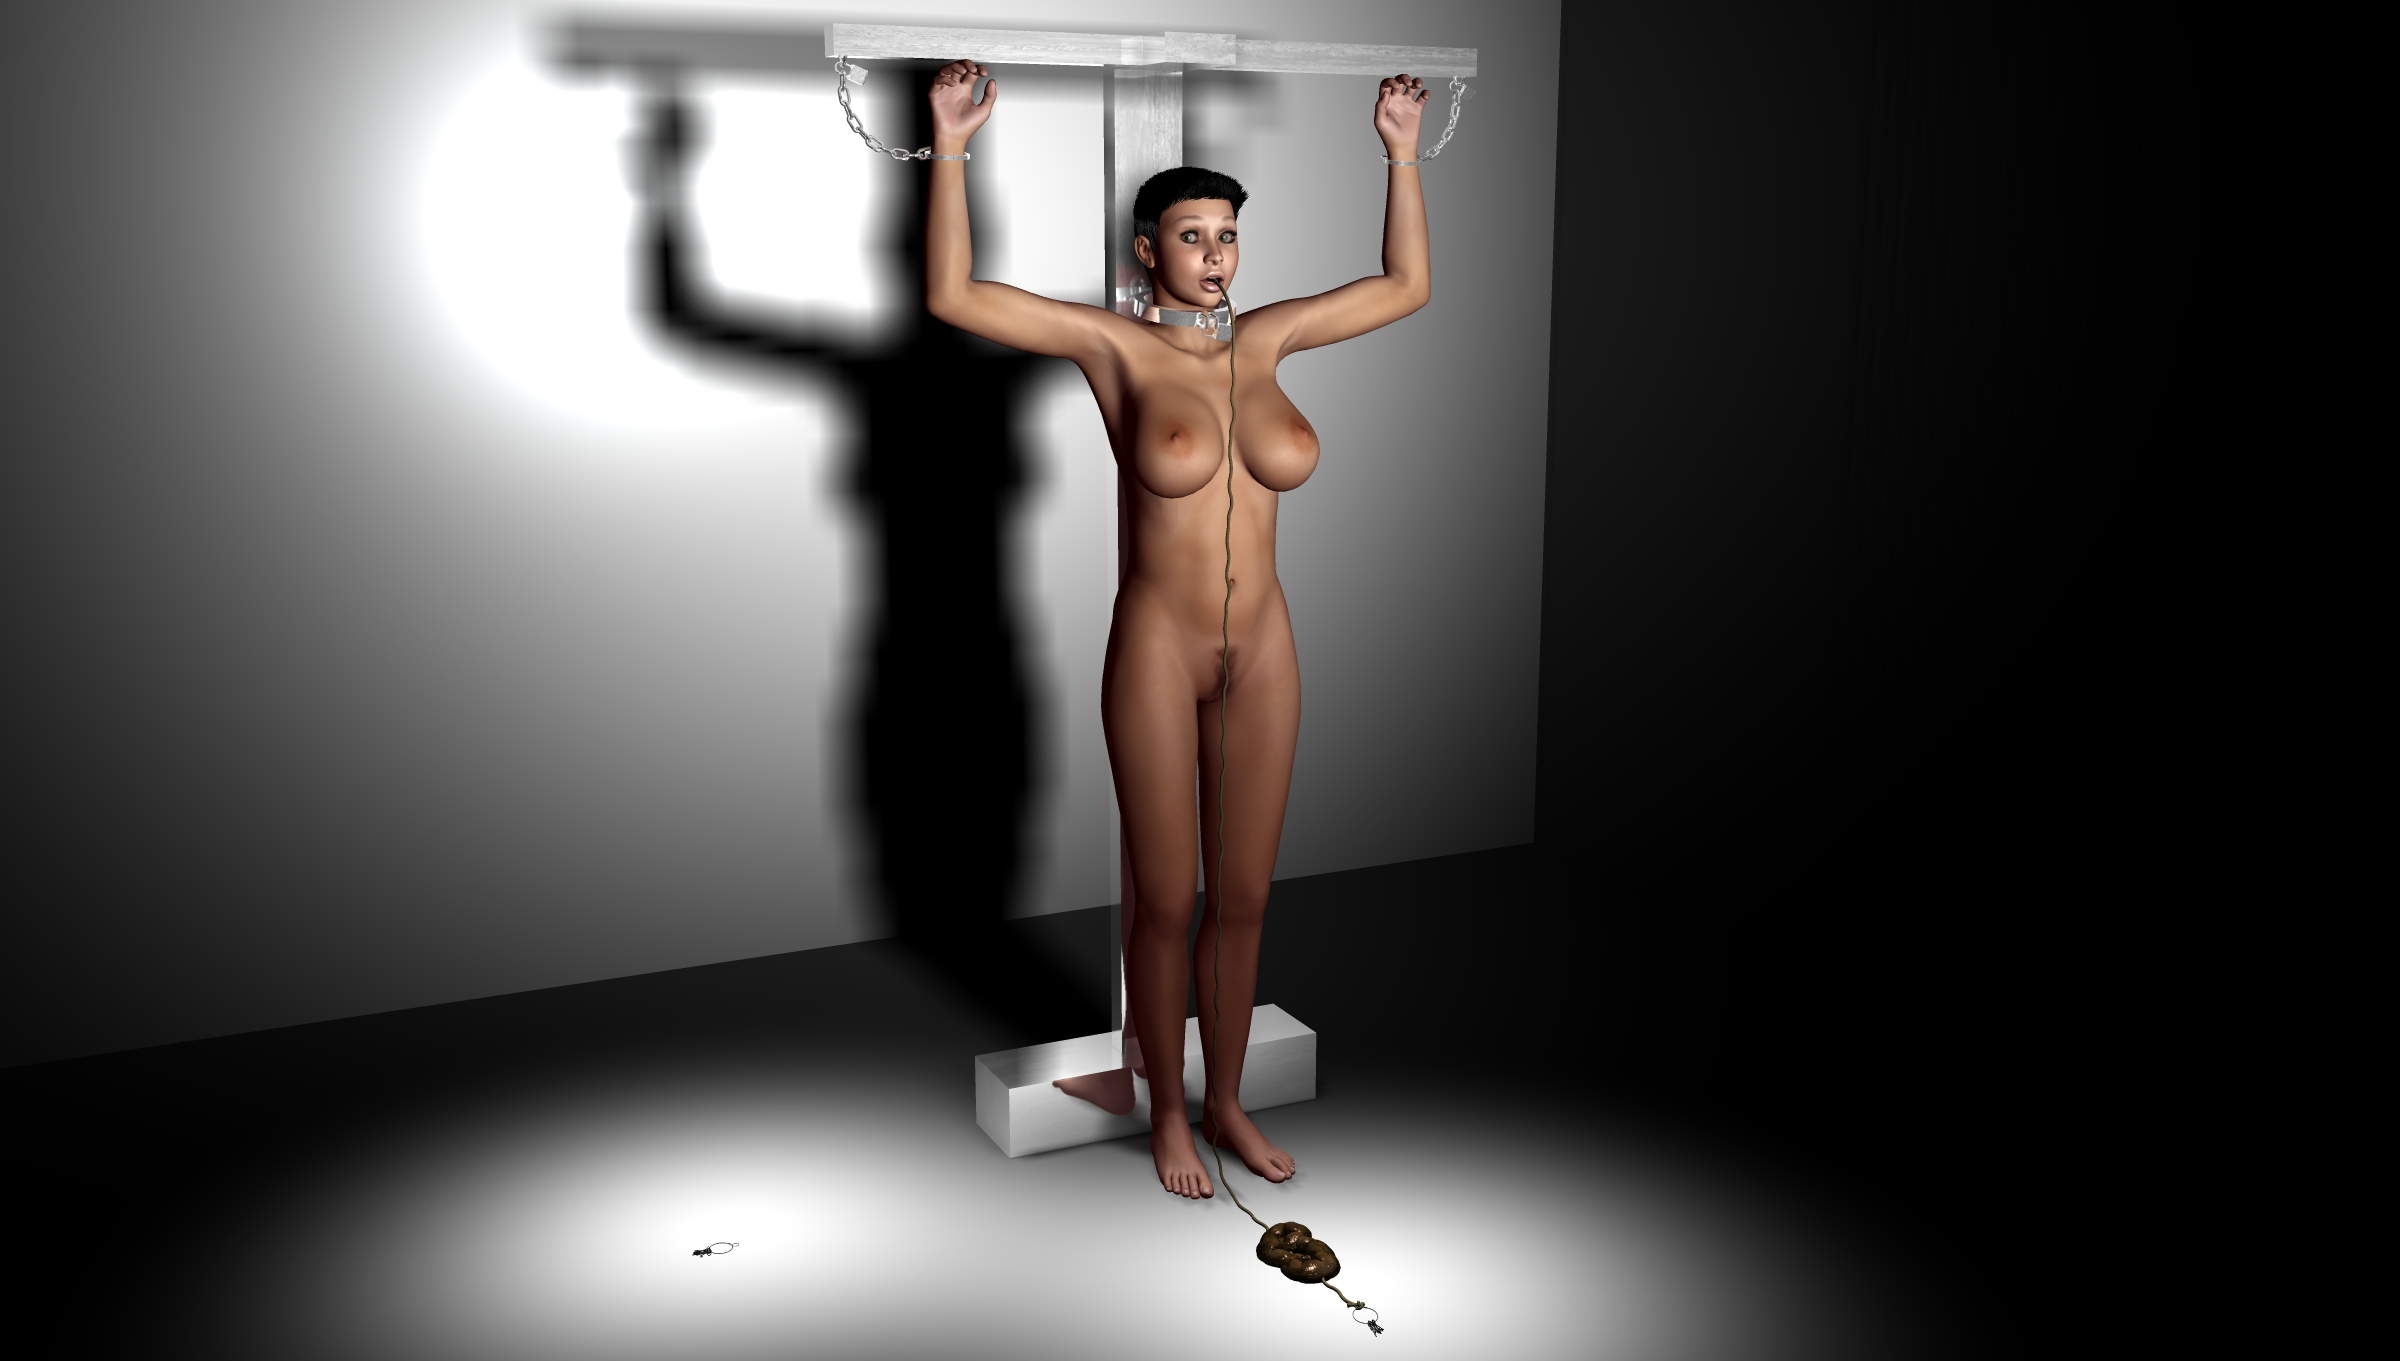 sex selber machen bondage art